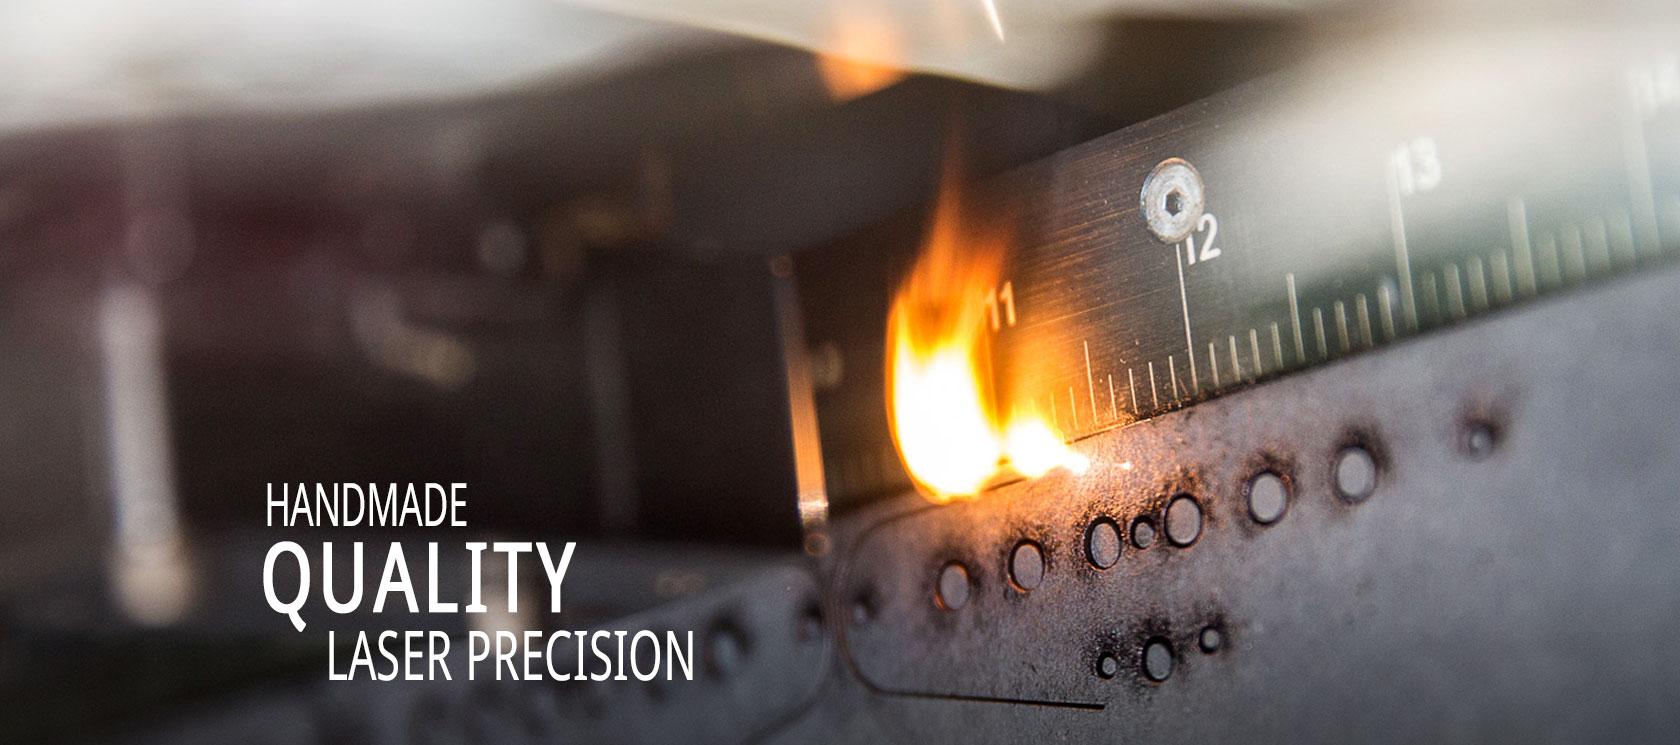 hight resolution of handmade quality laser precision